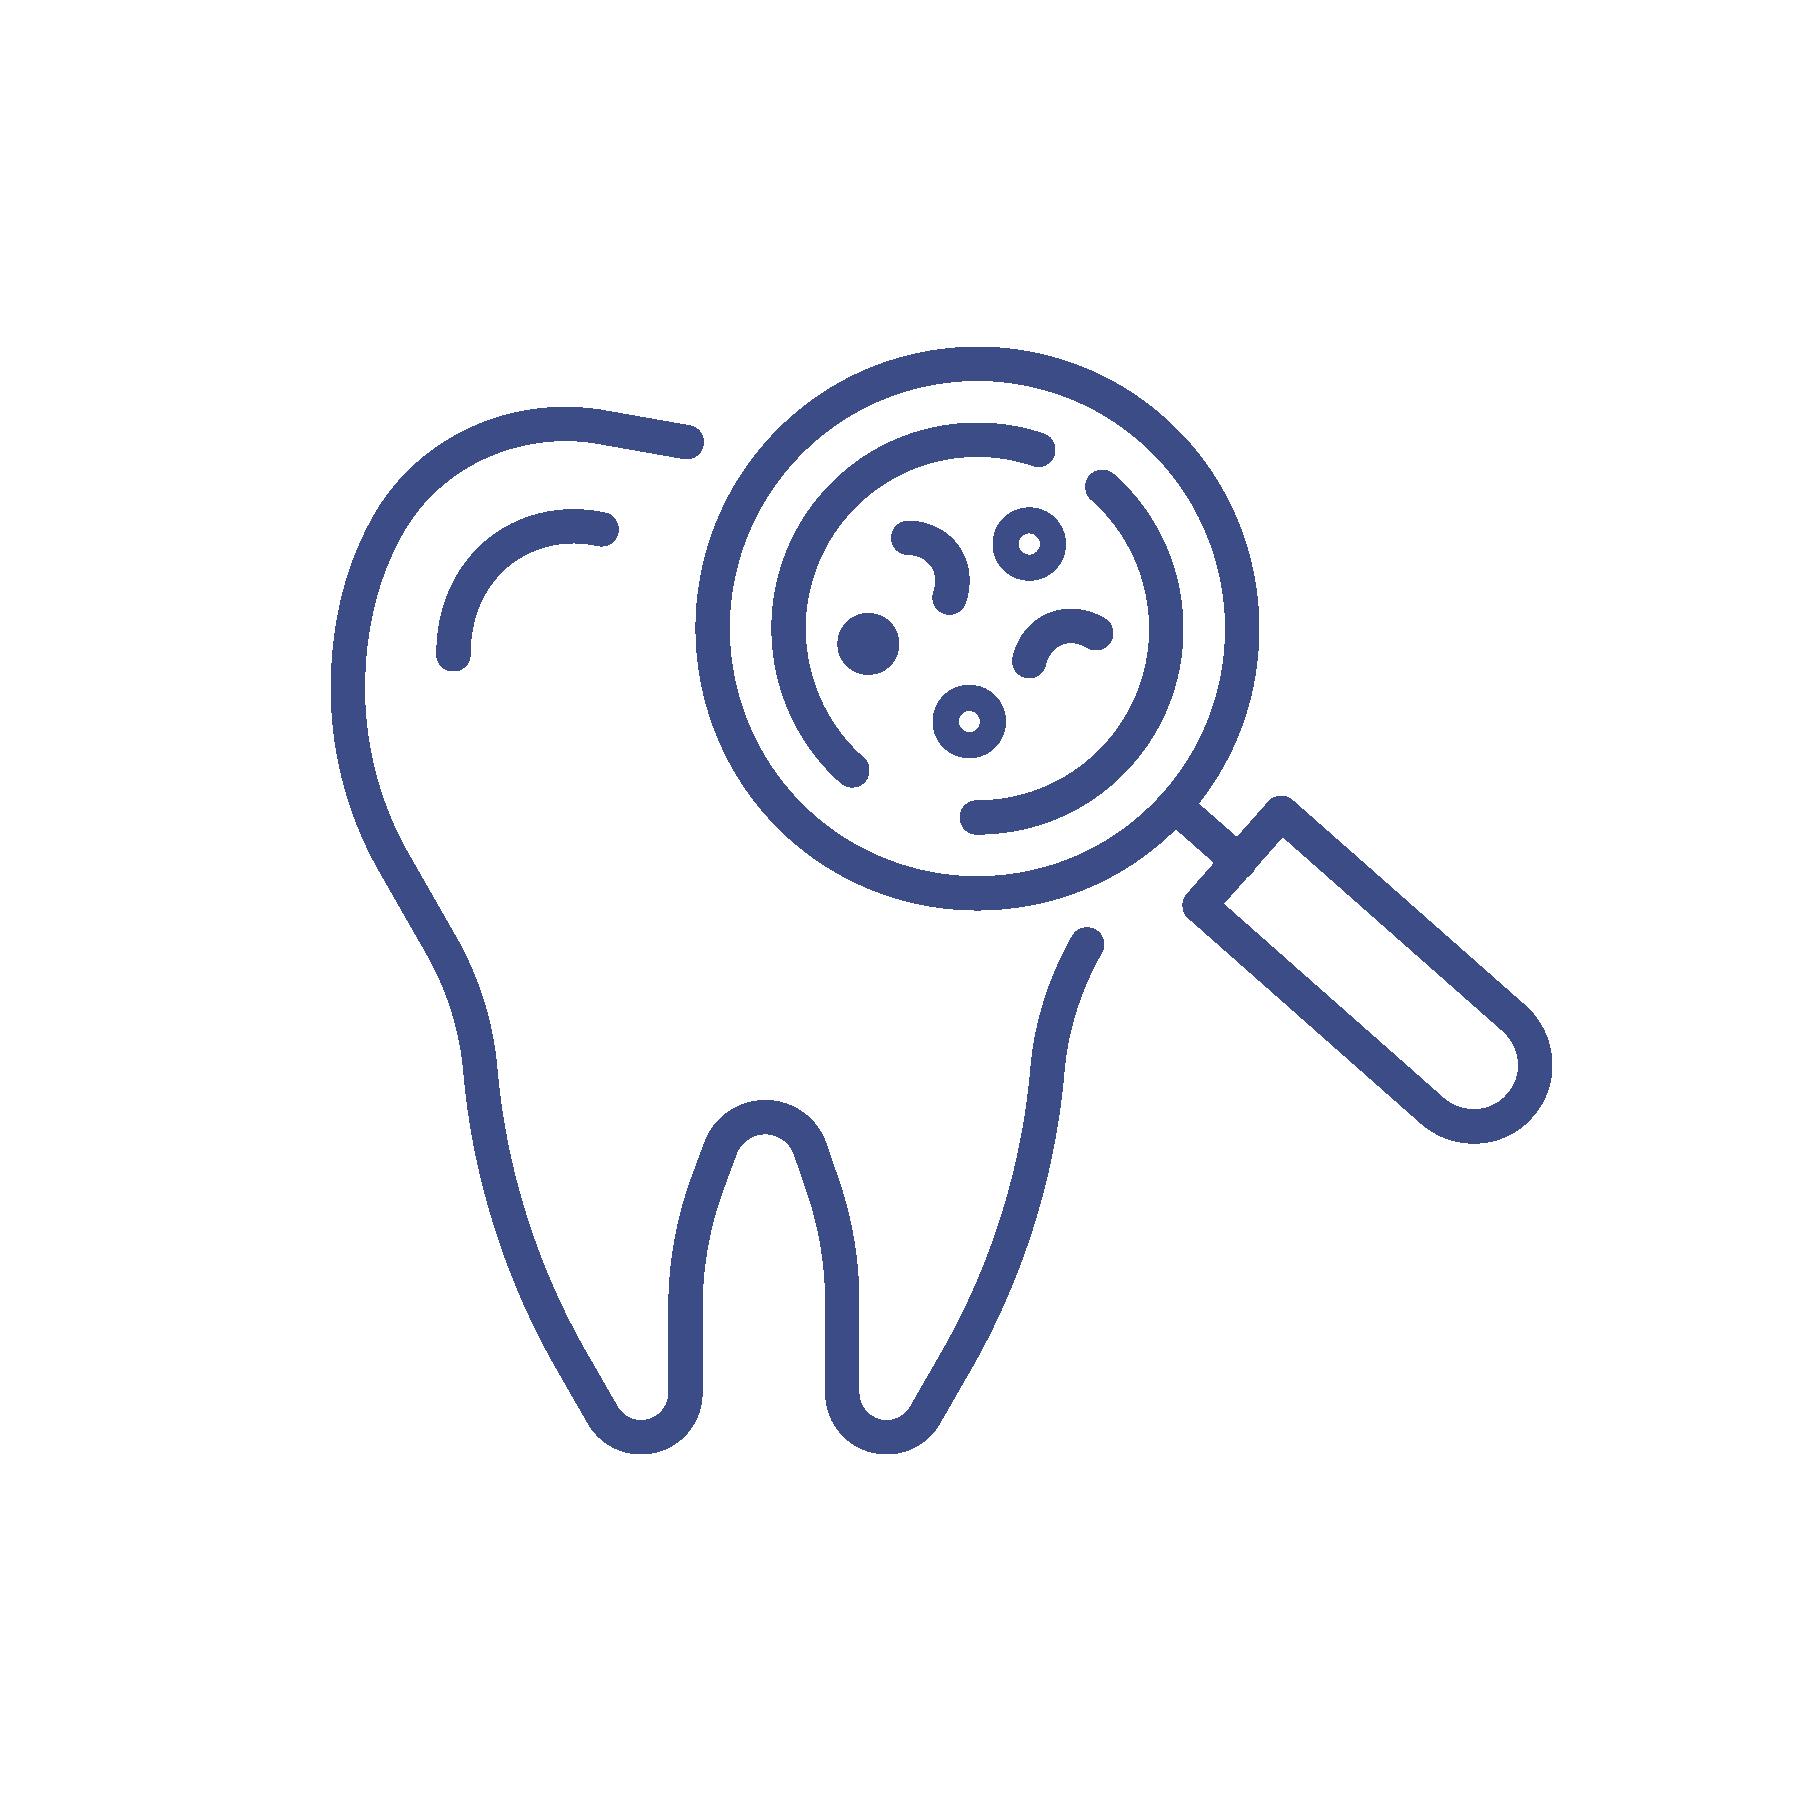 Tooth xray logo